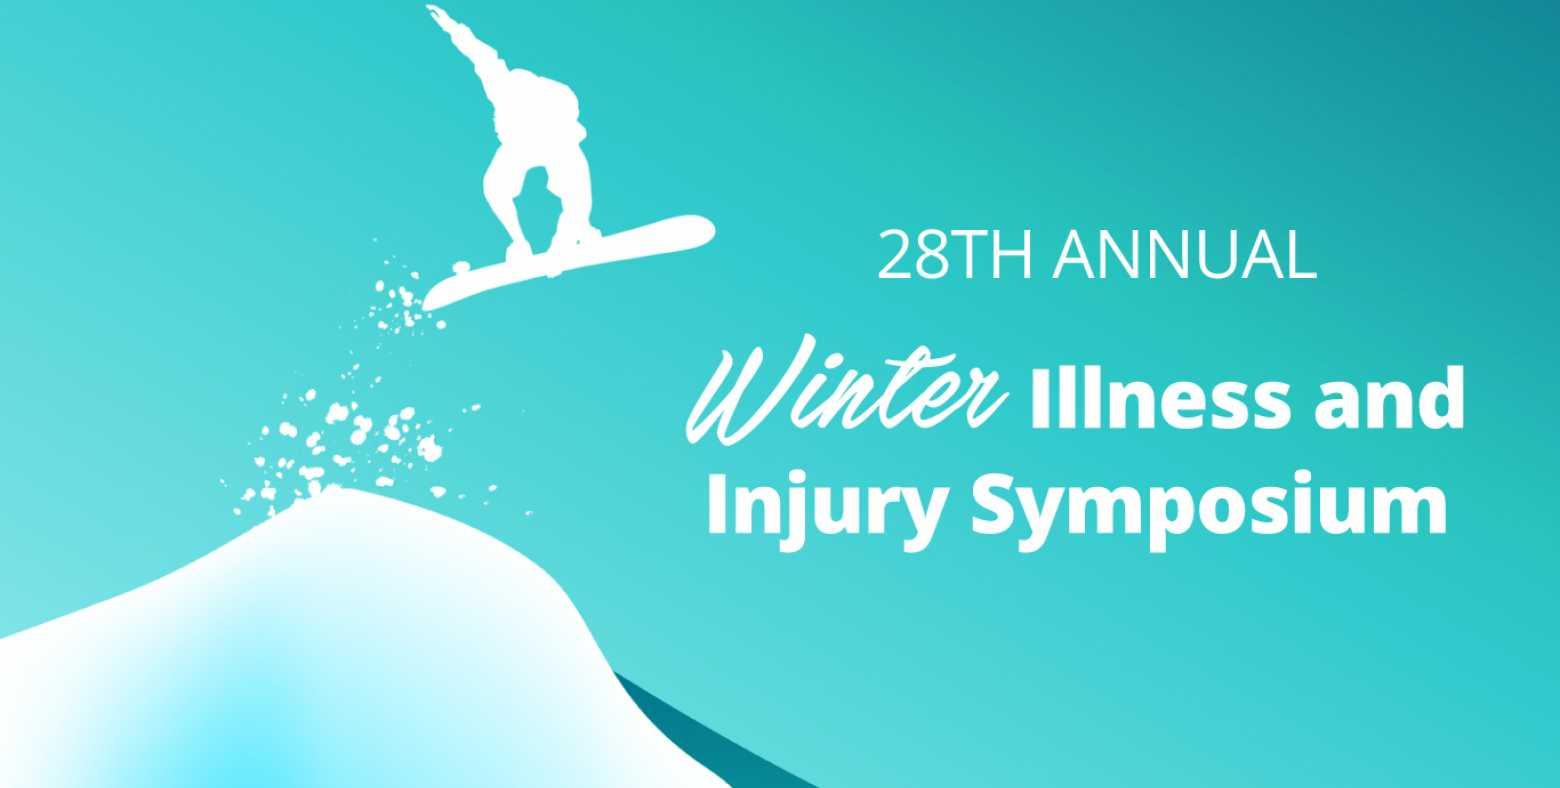 28th Annual Winter Illness and Injury Symposium (WIIS) graphic